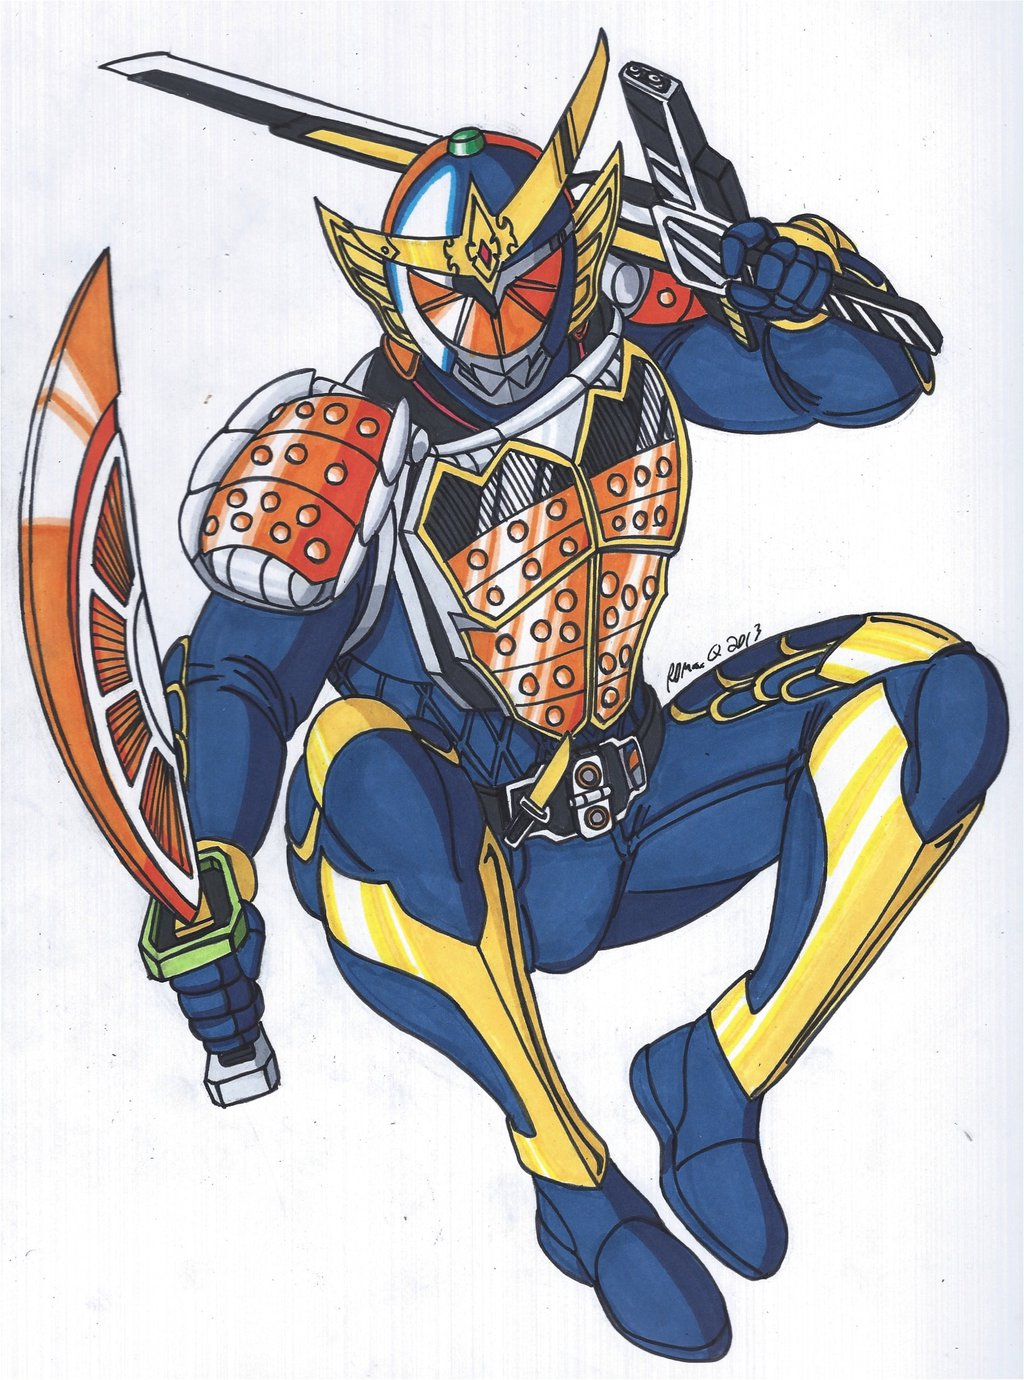 Drawn samurai kamen rider Gaim Kamen on RobertMacQuarrie1 Kamen